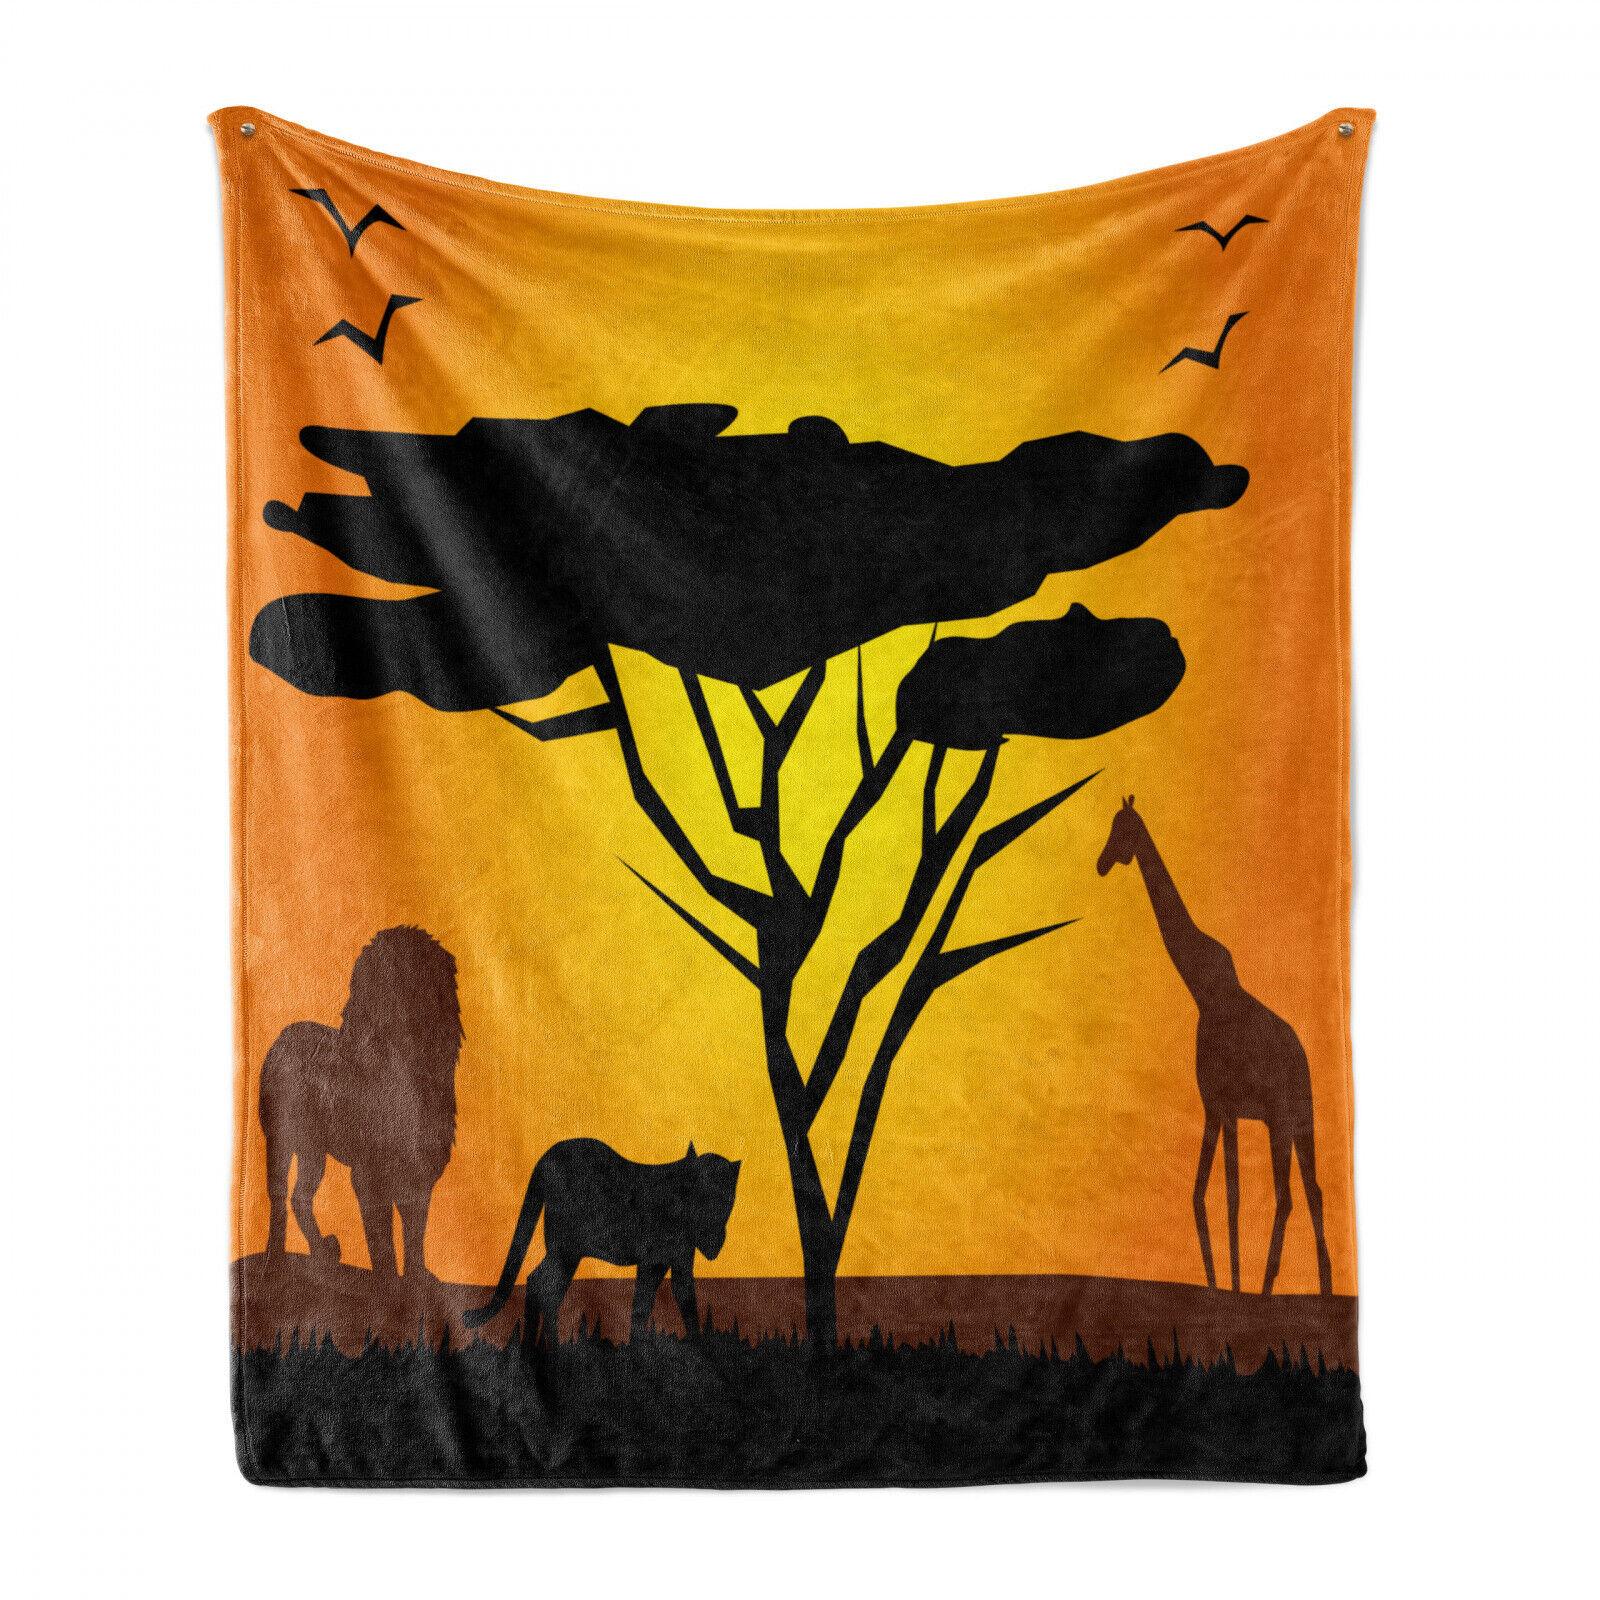 Giraffe Soft Flannel Fleece Blanket African Desert-lion-Tiger